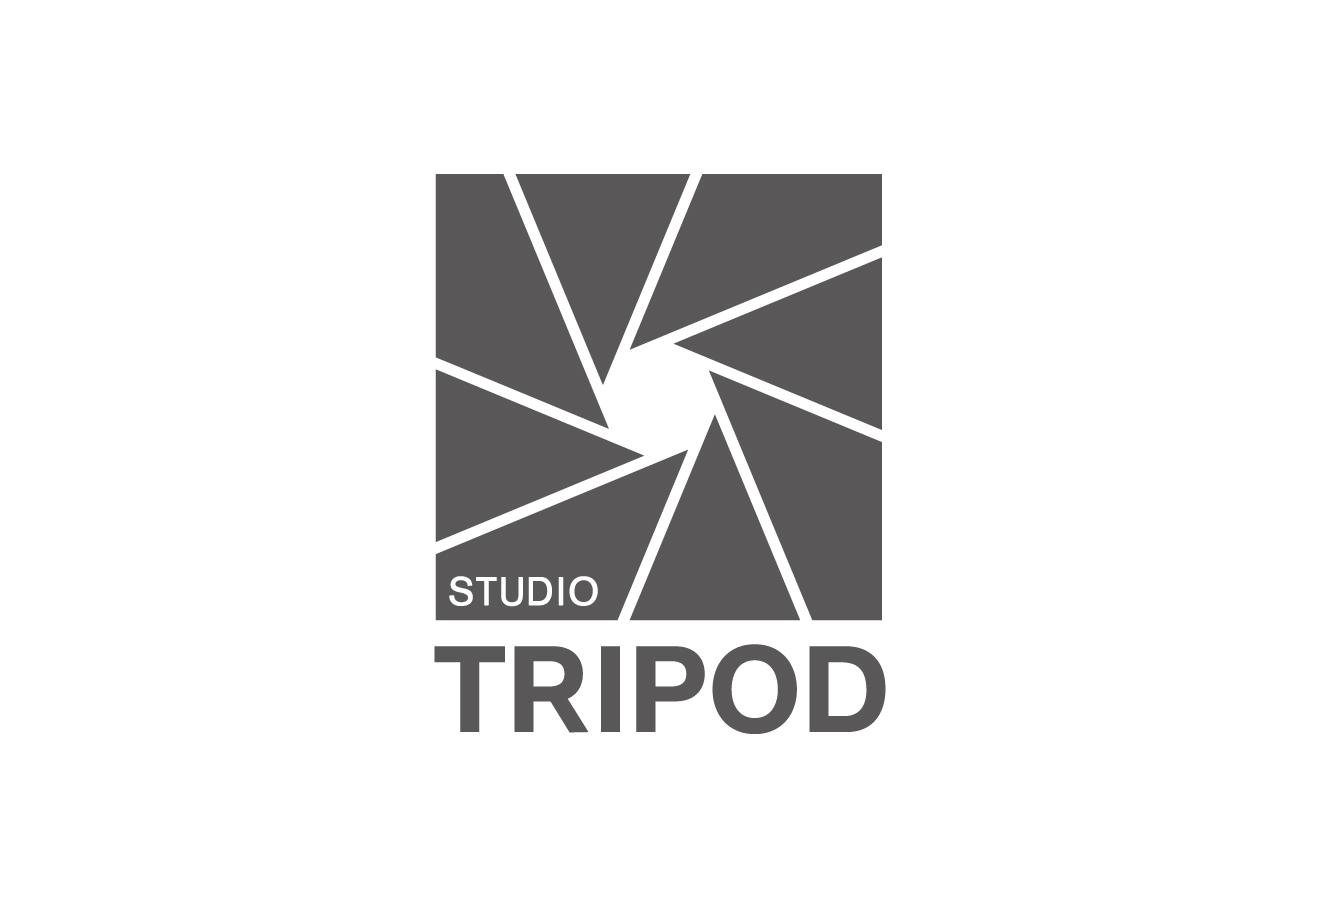 Studio TRIPOD